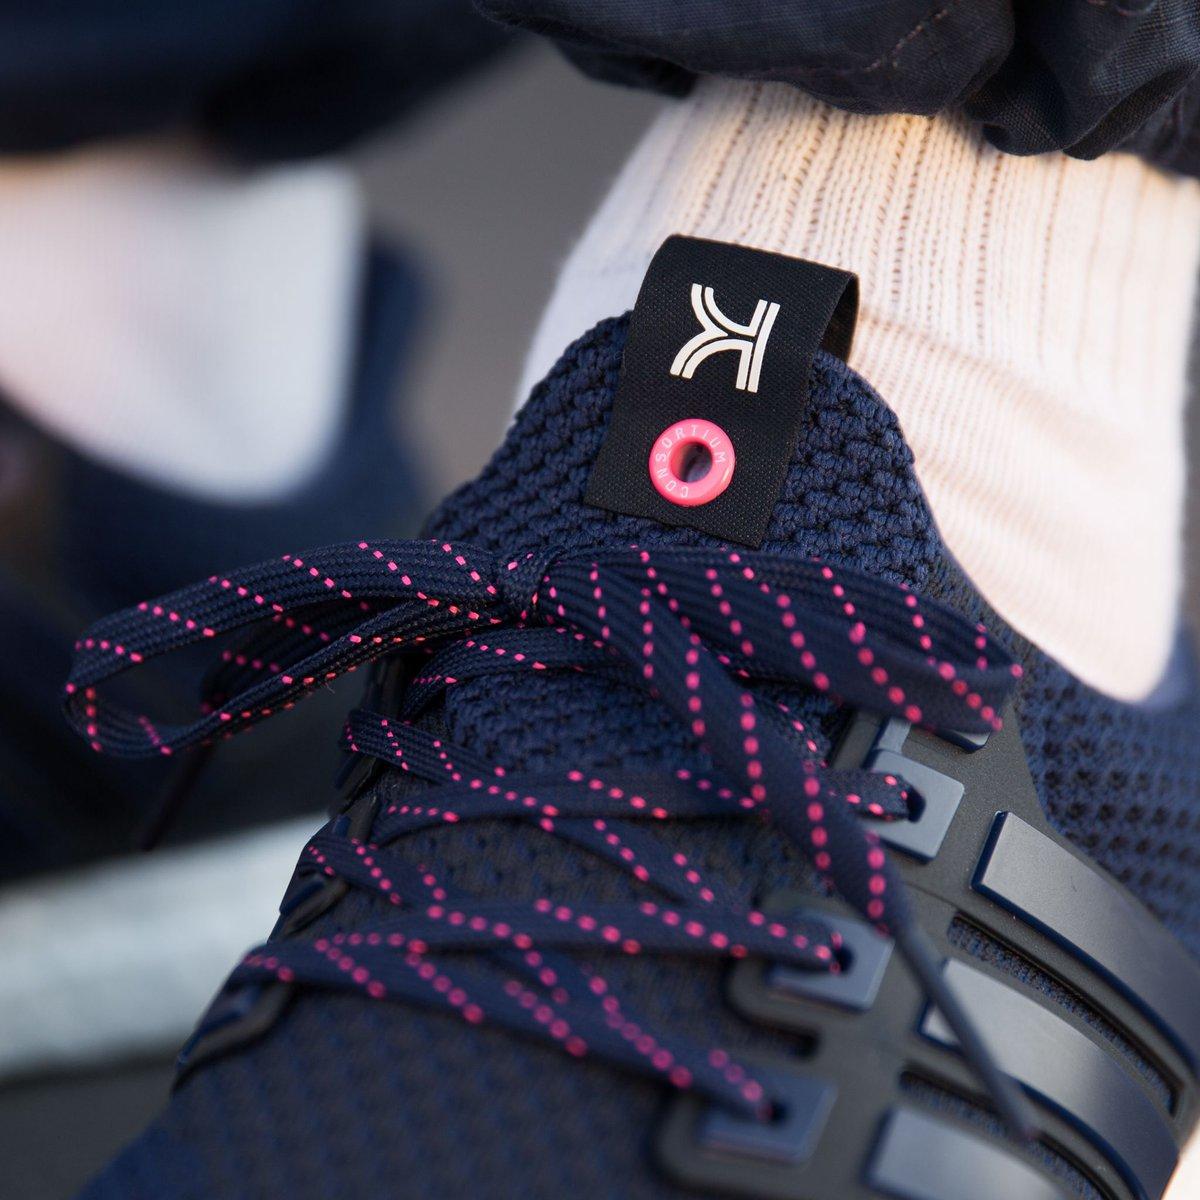 875fcd4c7a7 ...  adidas  ultraboost ·  ub  navy  red  multicolor  sale  sales   wintersale  midsale  sneakers  discountpic.twitter.com JodRhnm4zt